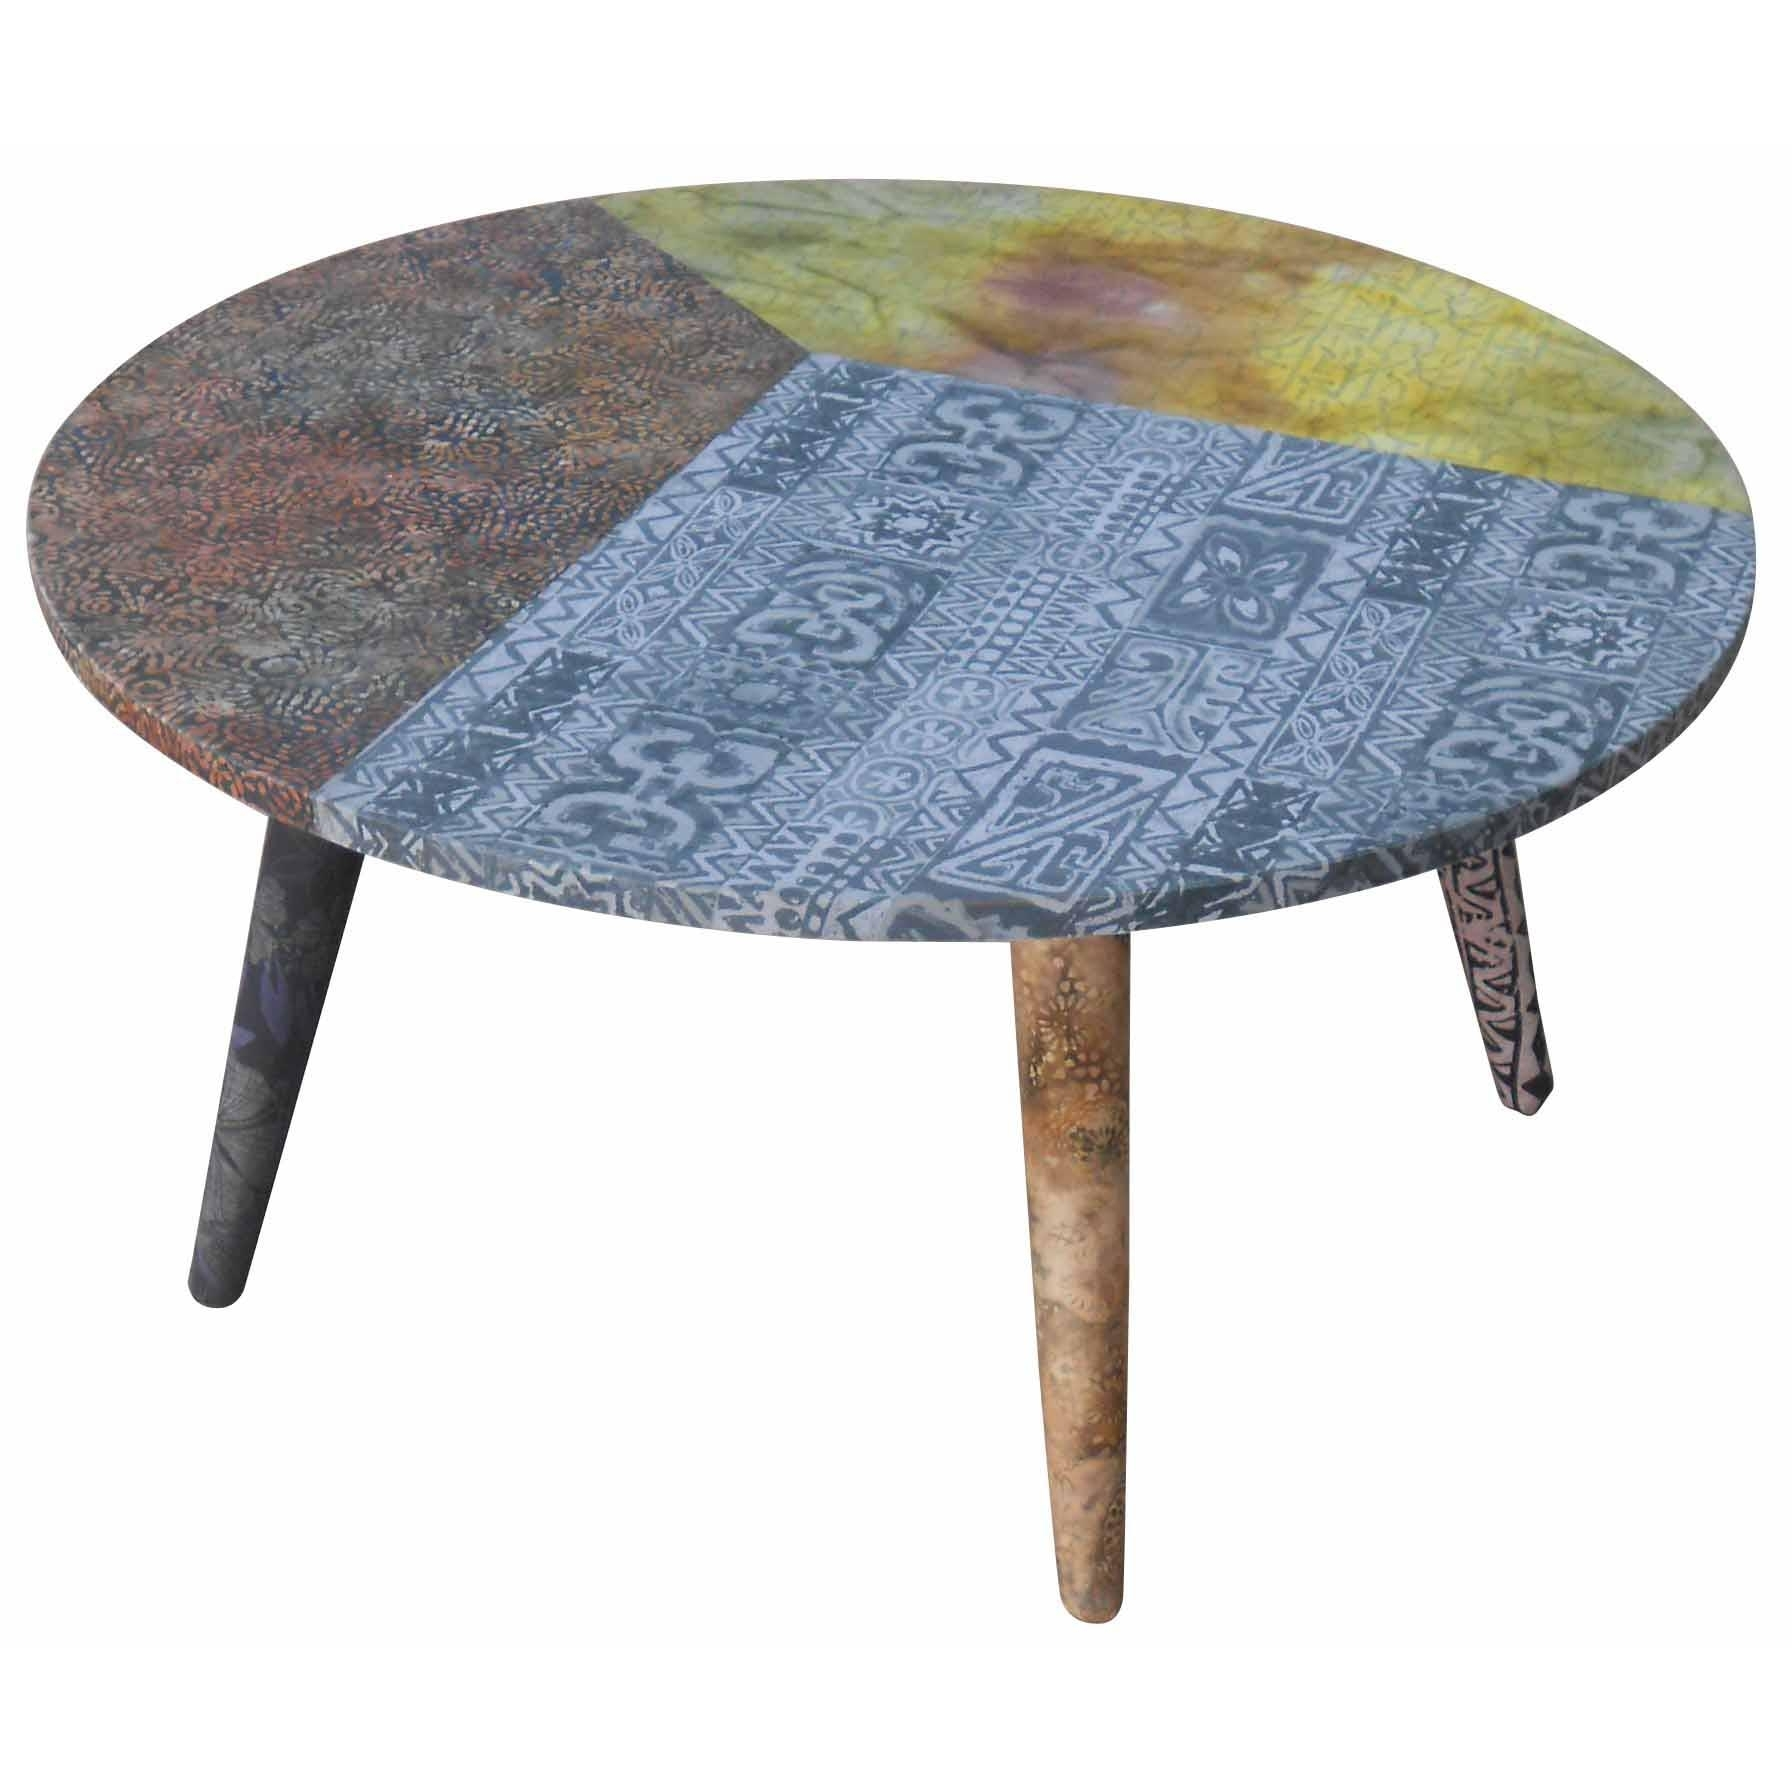 Keen Coffee Table, Batik - Boulevard Urban Living intended for Batik Coffee Tables (Image 21 of 30)